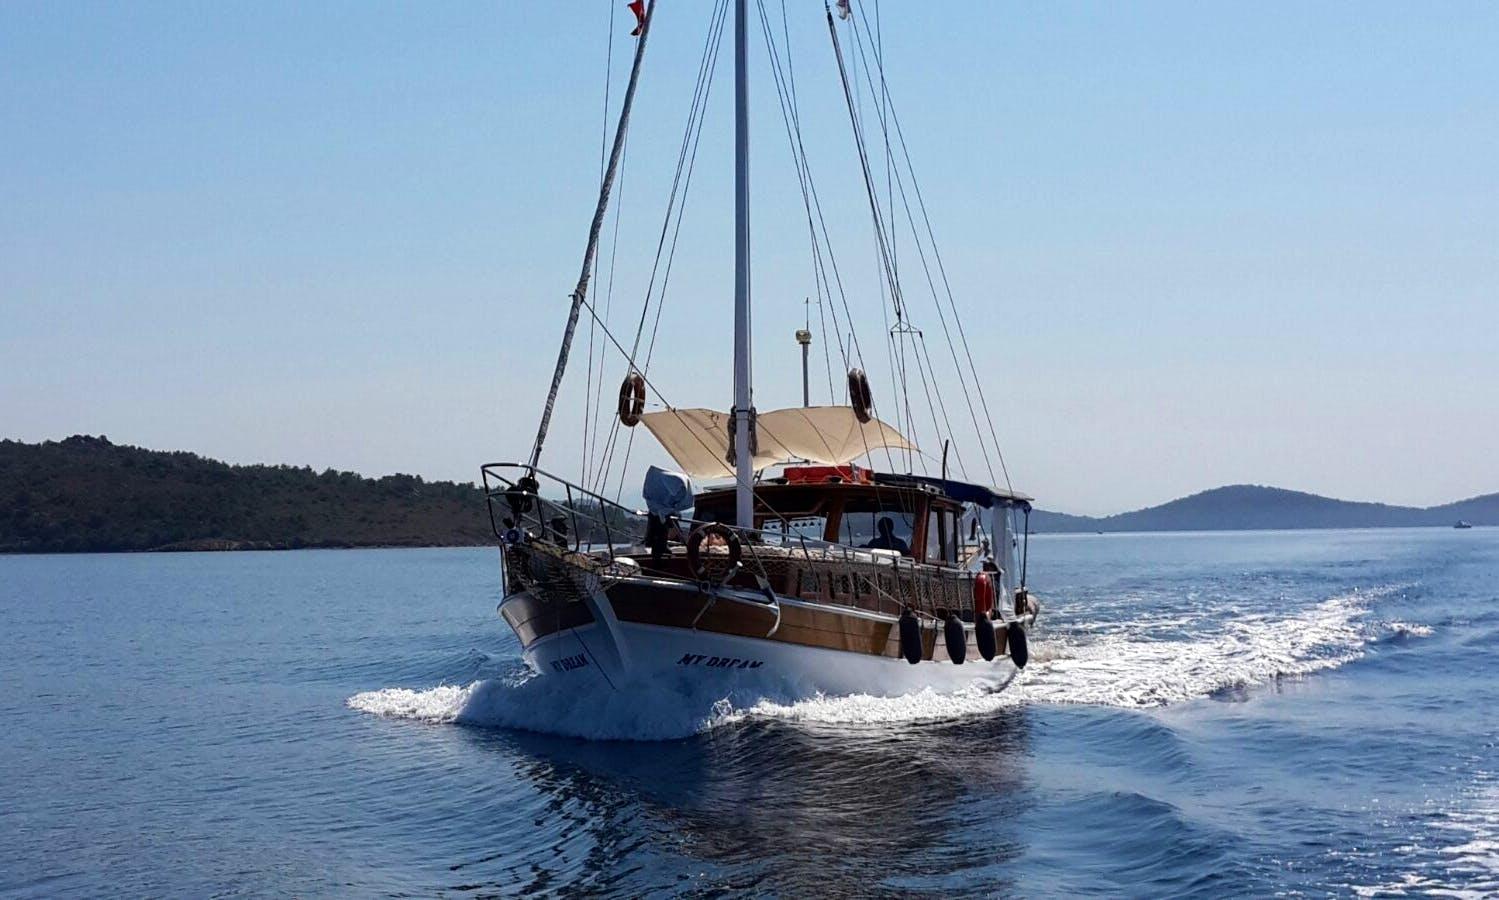 Sloop Charters in  Mithatpasa Mah, Turkey